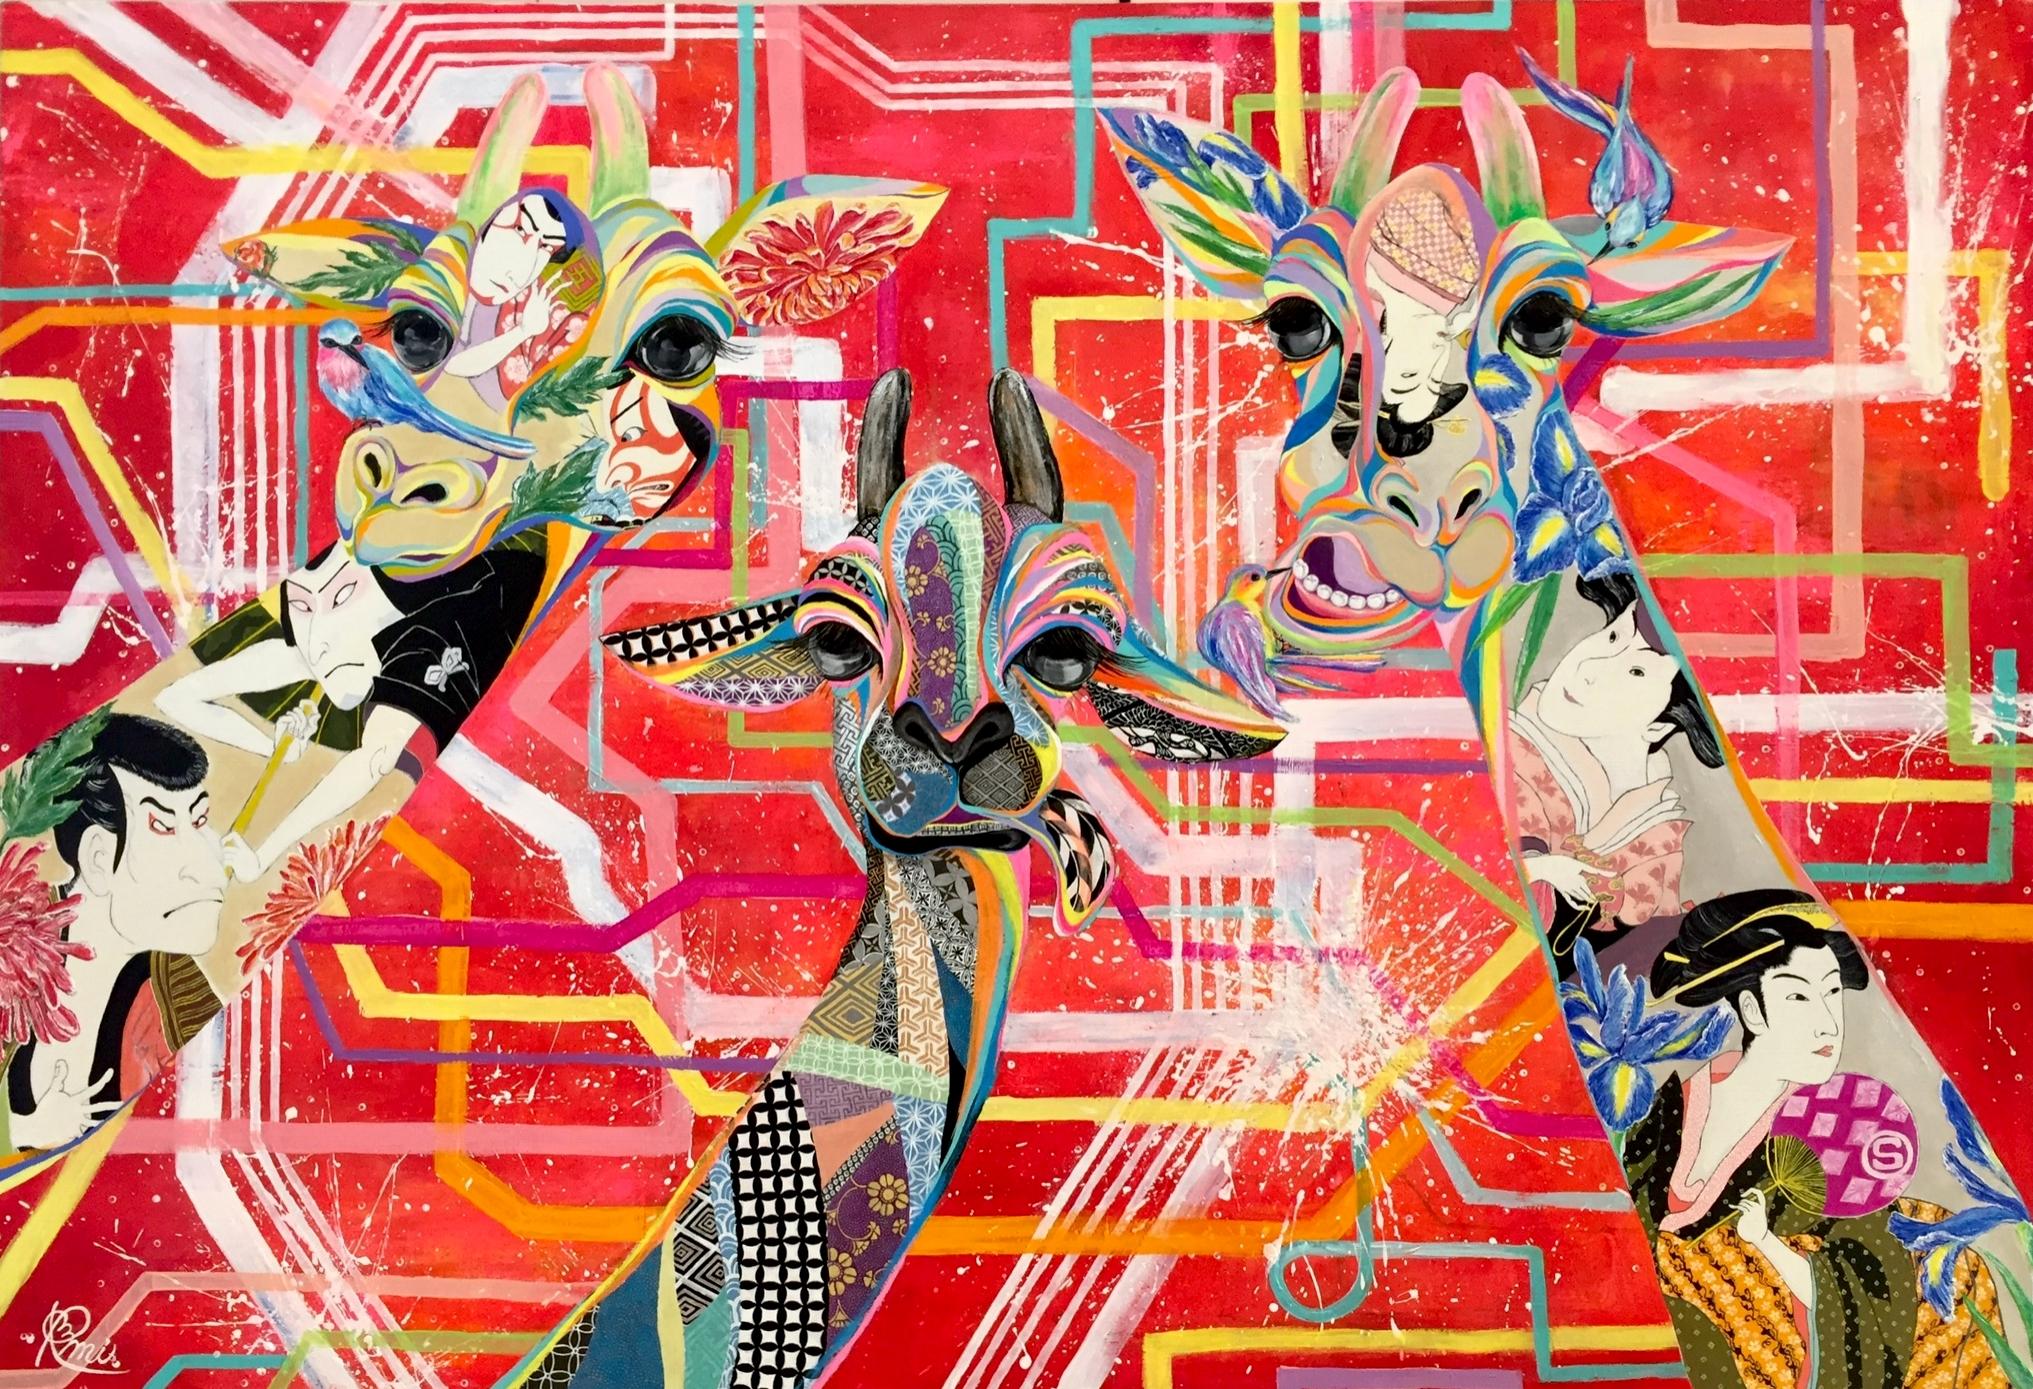 『Le lien』 acrylic on canvas ( 80.3×116.7cm/ P50 )  銀座アストラ歯科クリニック納入作品